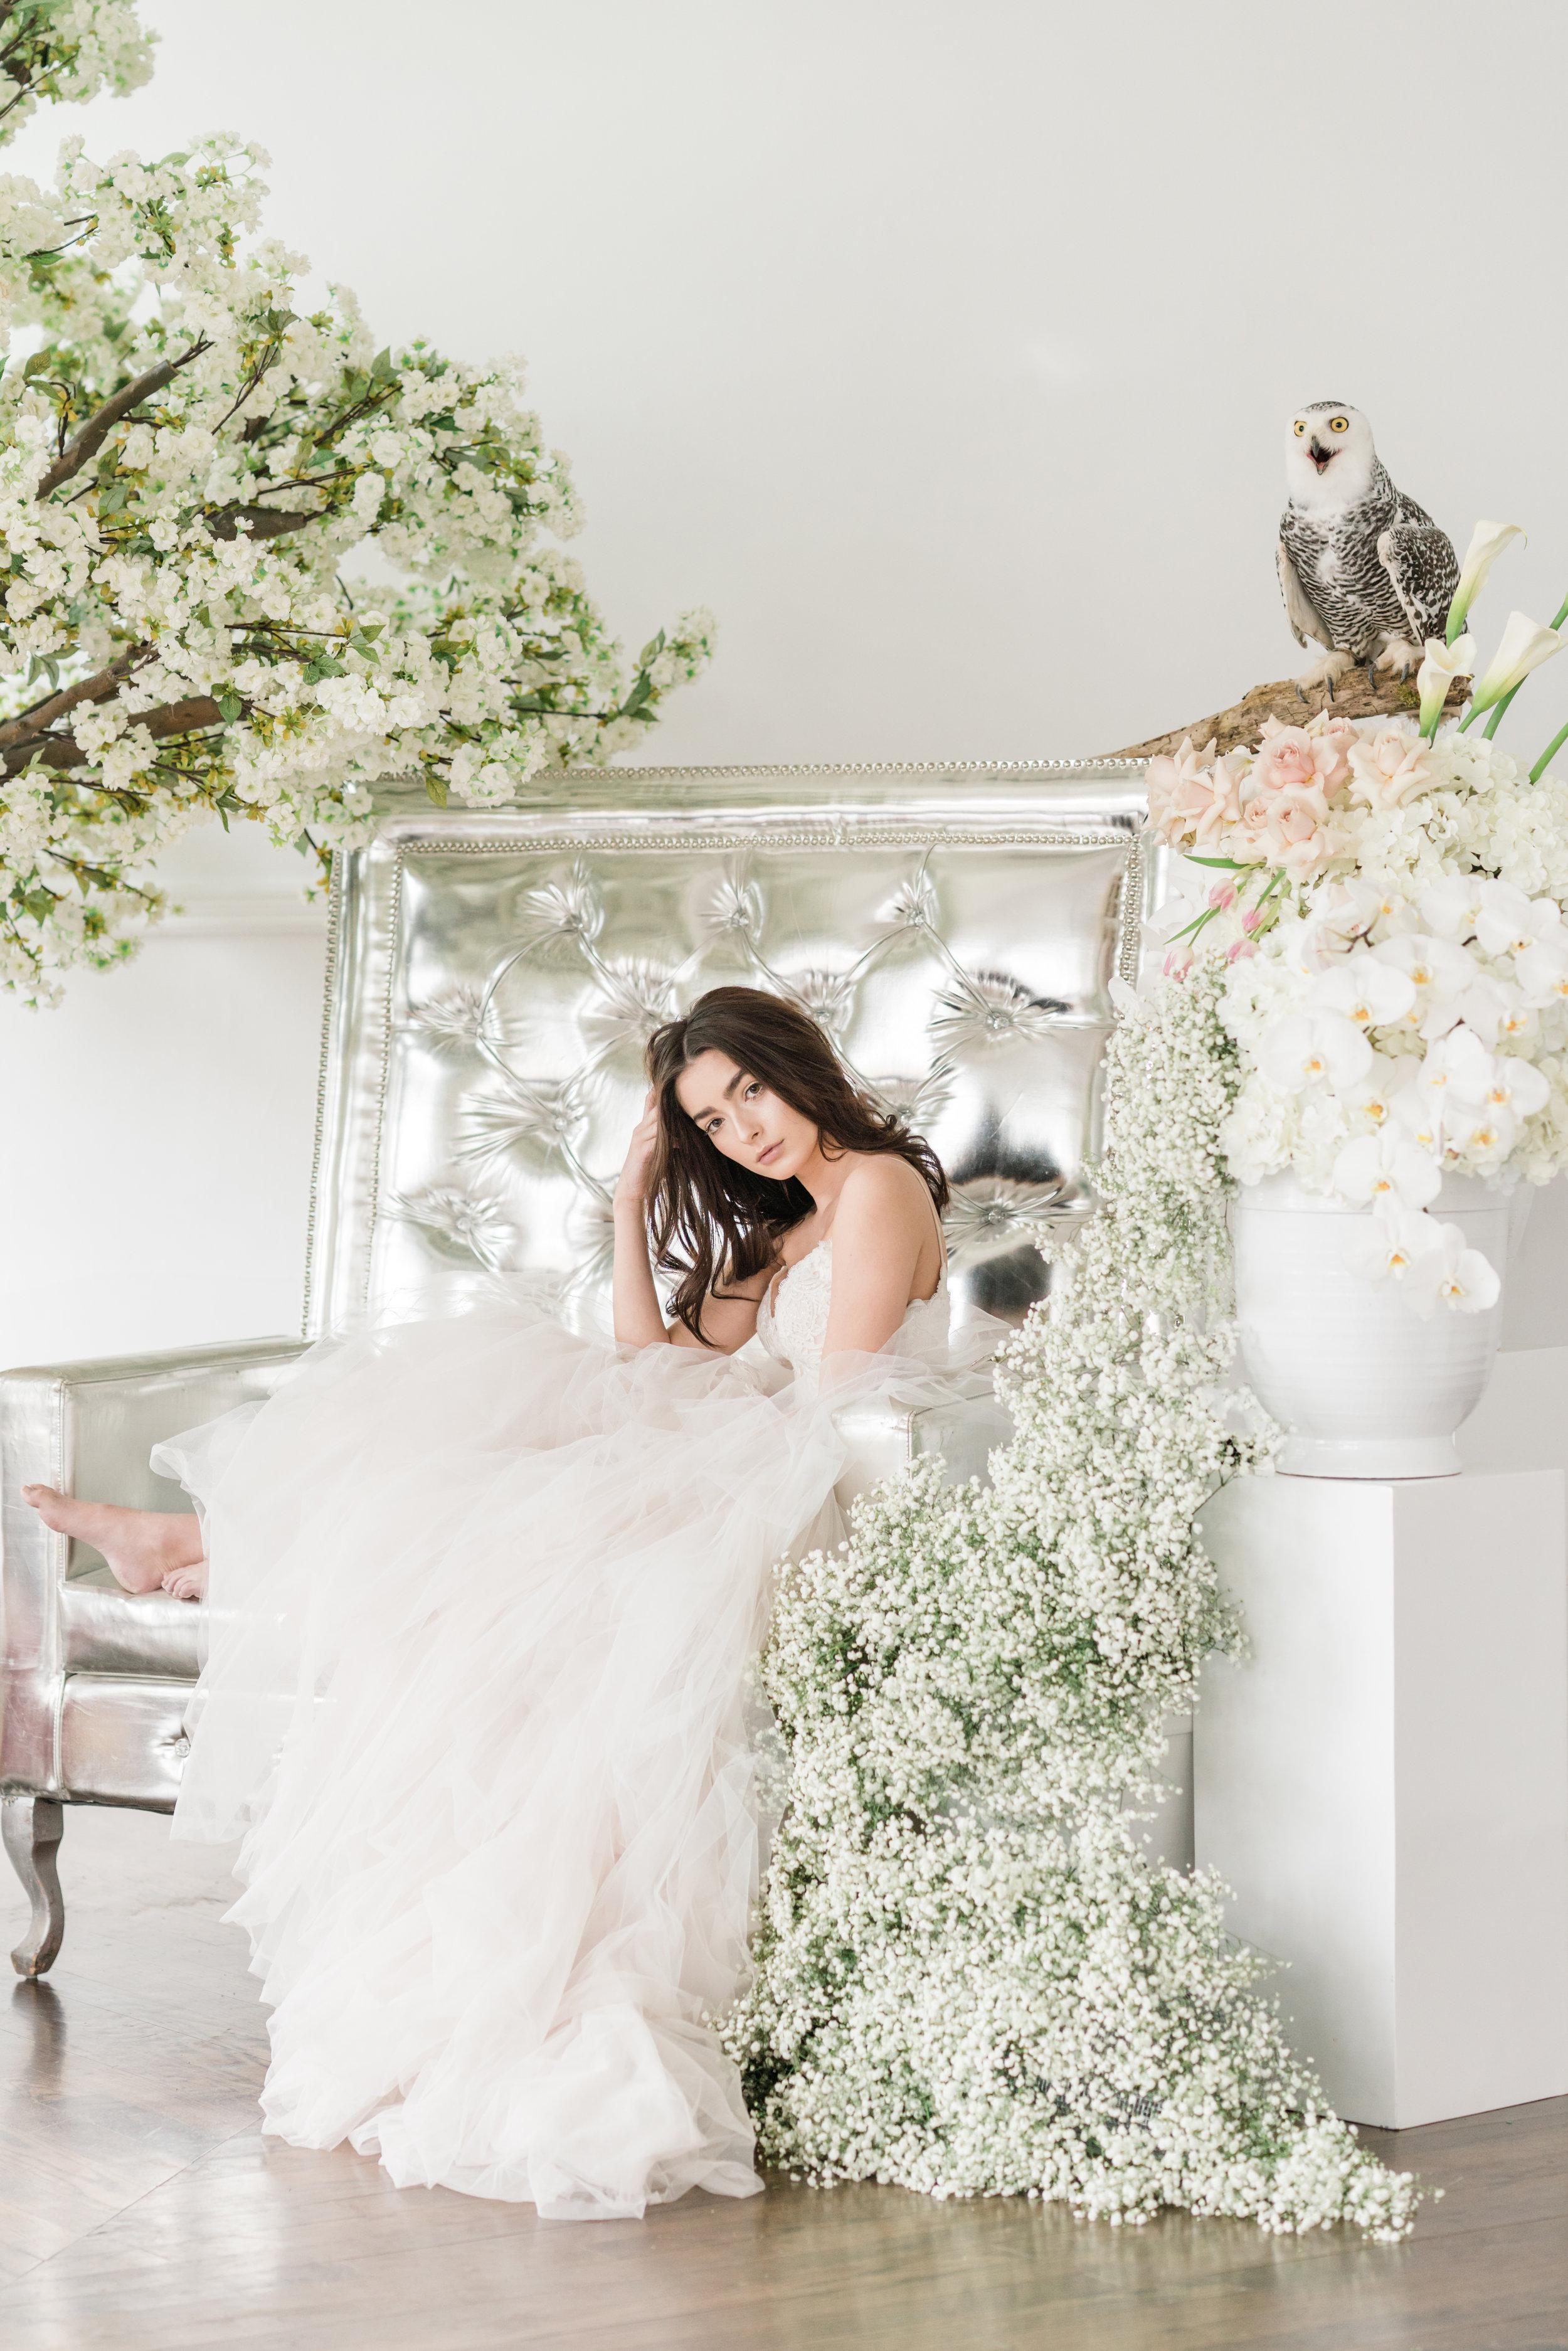 August In Bloom - Fantasy Bride - Serene Dream (Wedluxe)